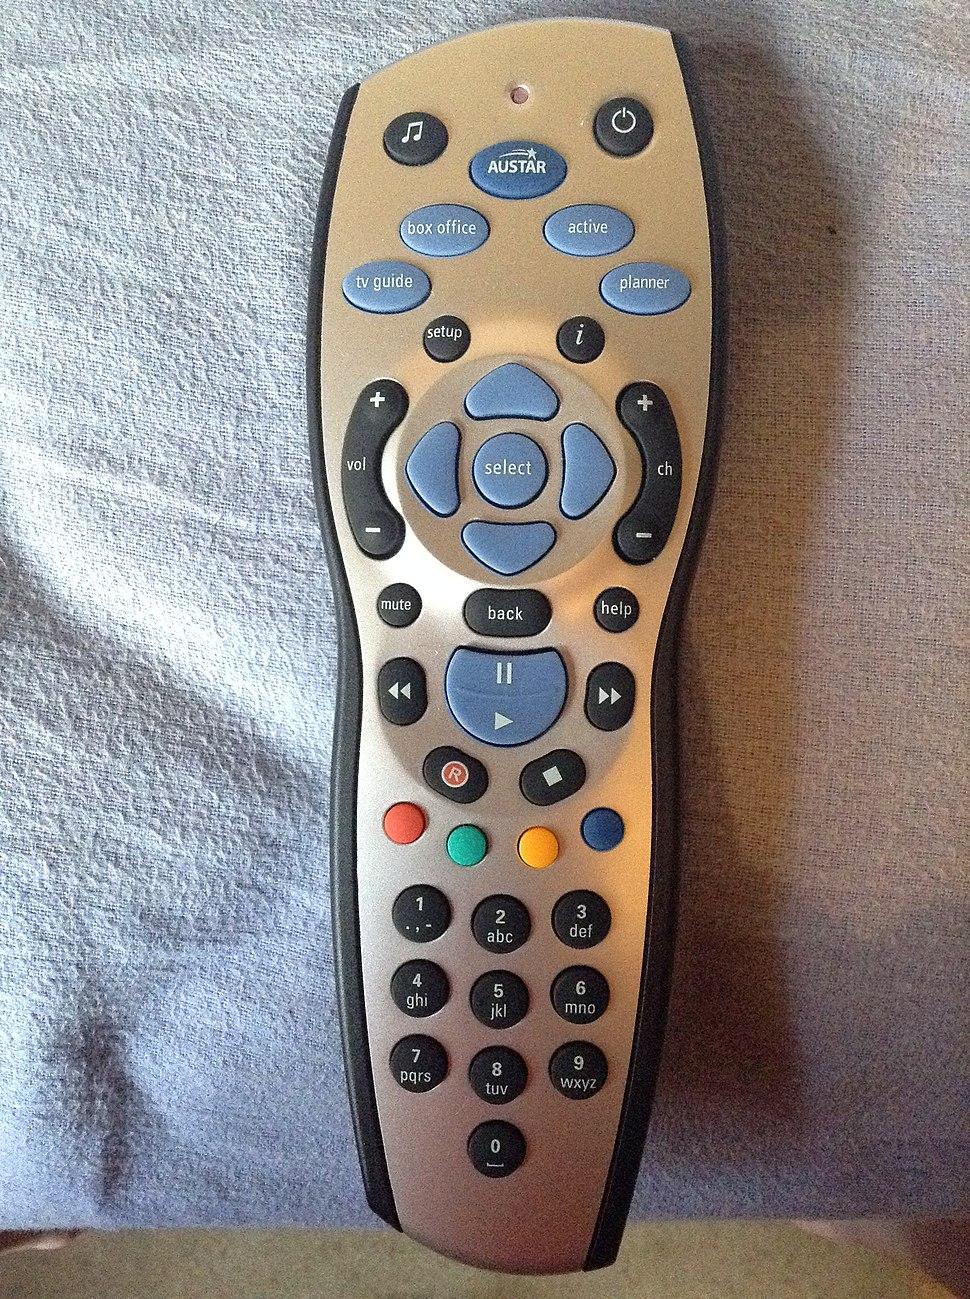 Mystar remote